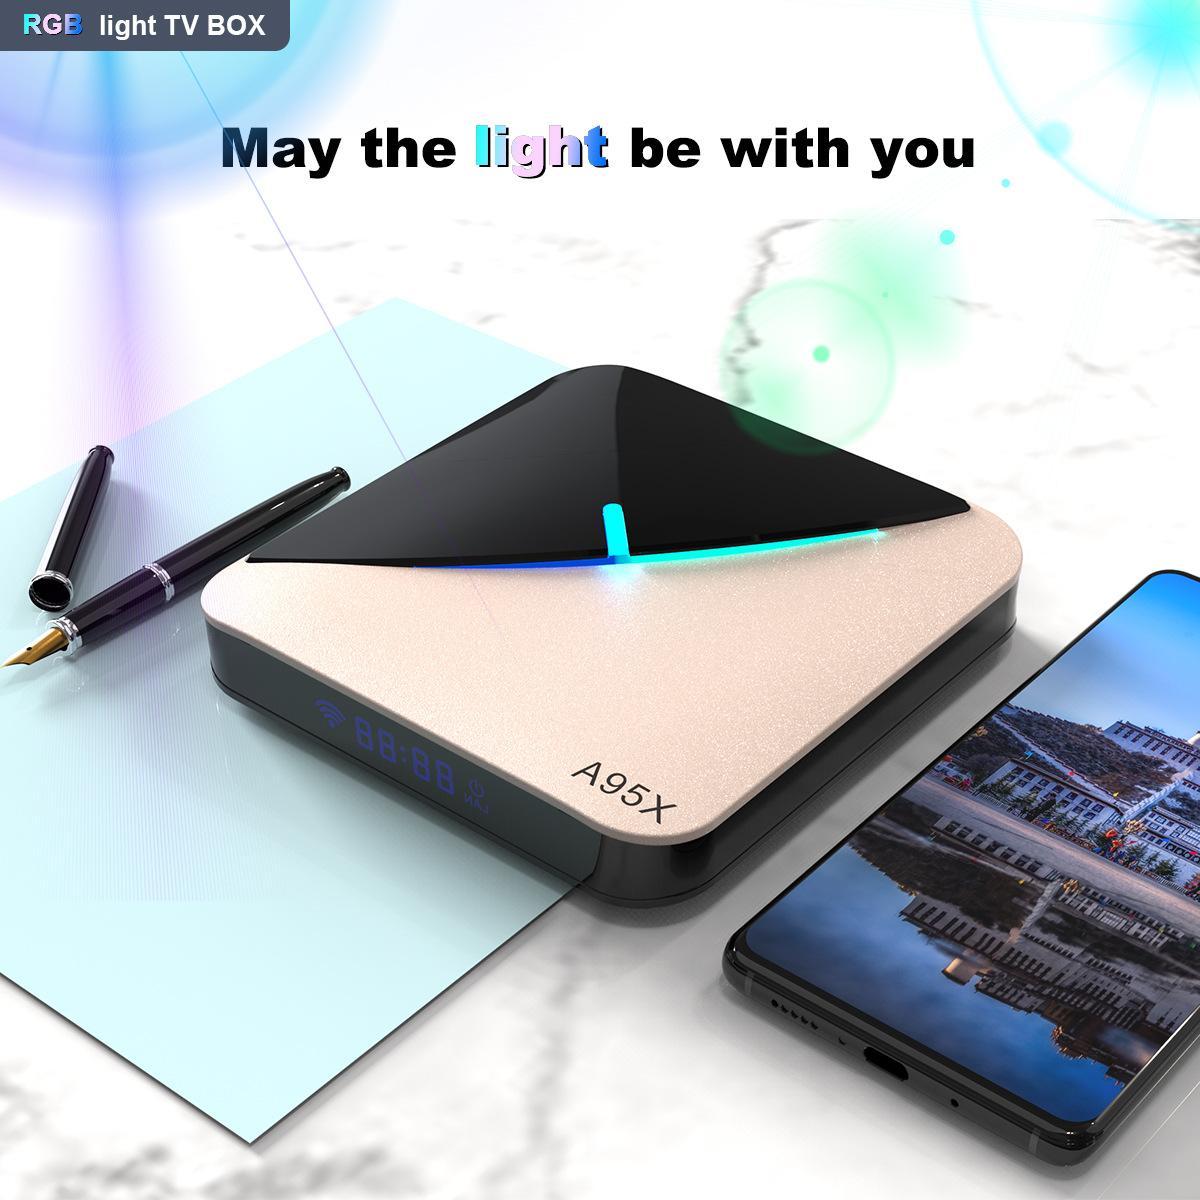 Android 9,0 RGB de luz inteligente TV caja Amlogic S905X3 USB3.0 1080P H.265 4K 60fps Wifi Google Play Netflix, Youtube A95X F3 aire 8K